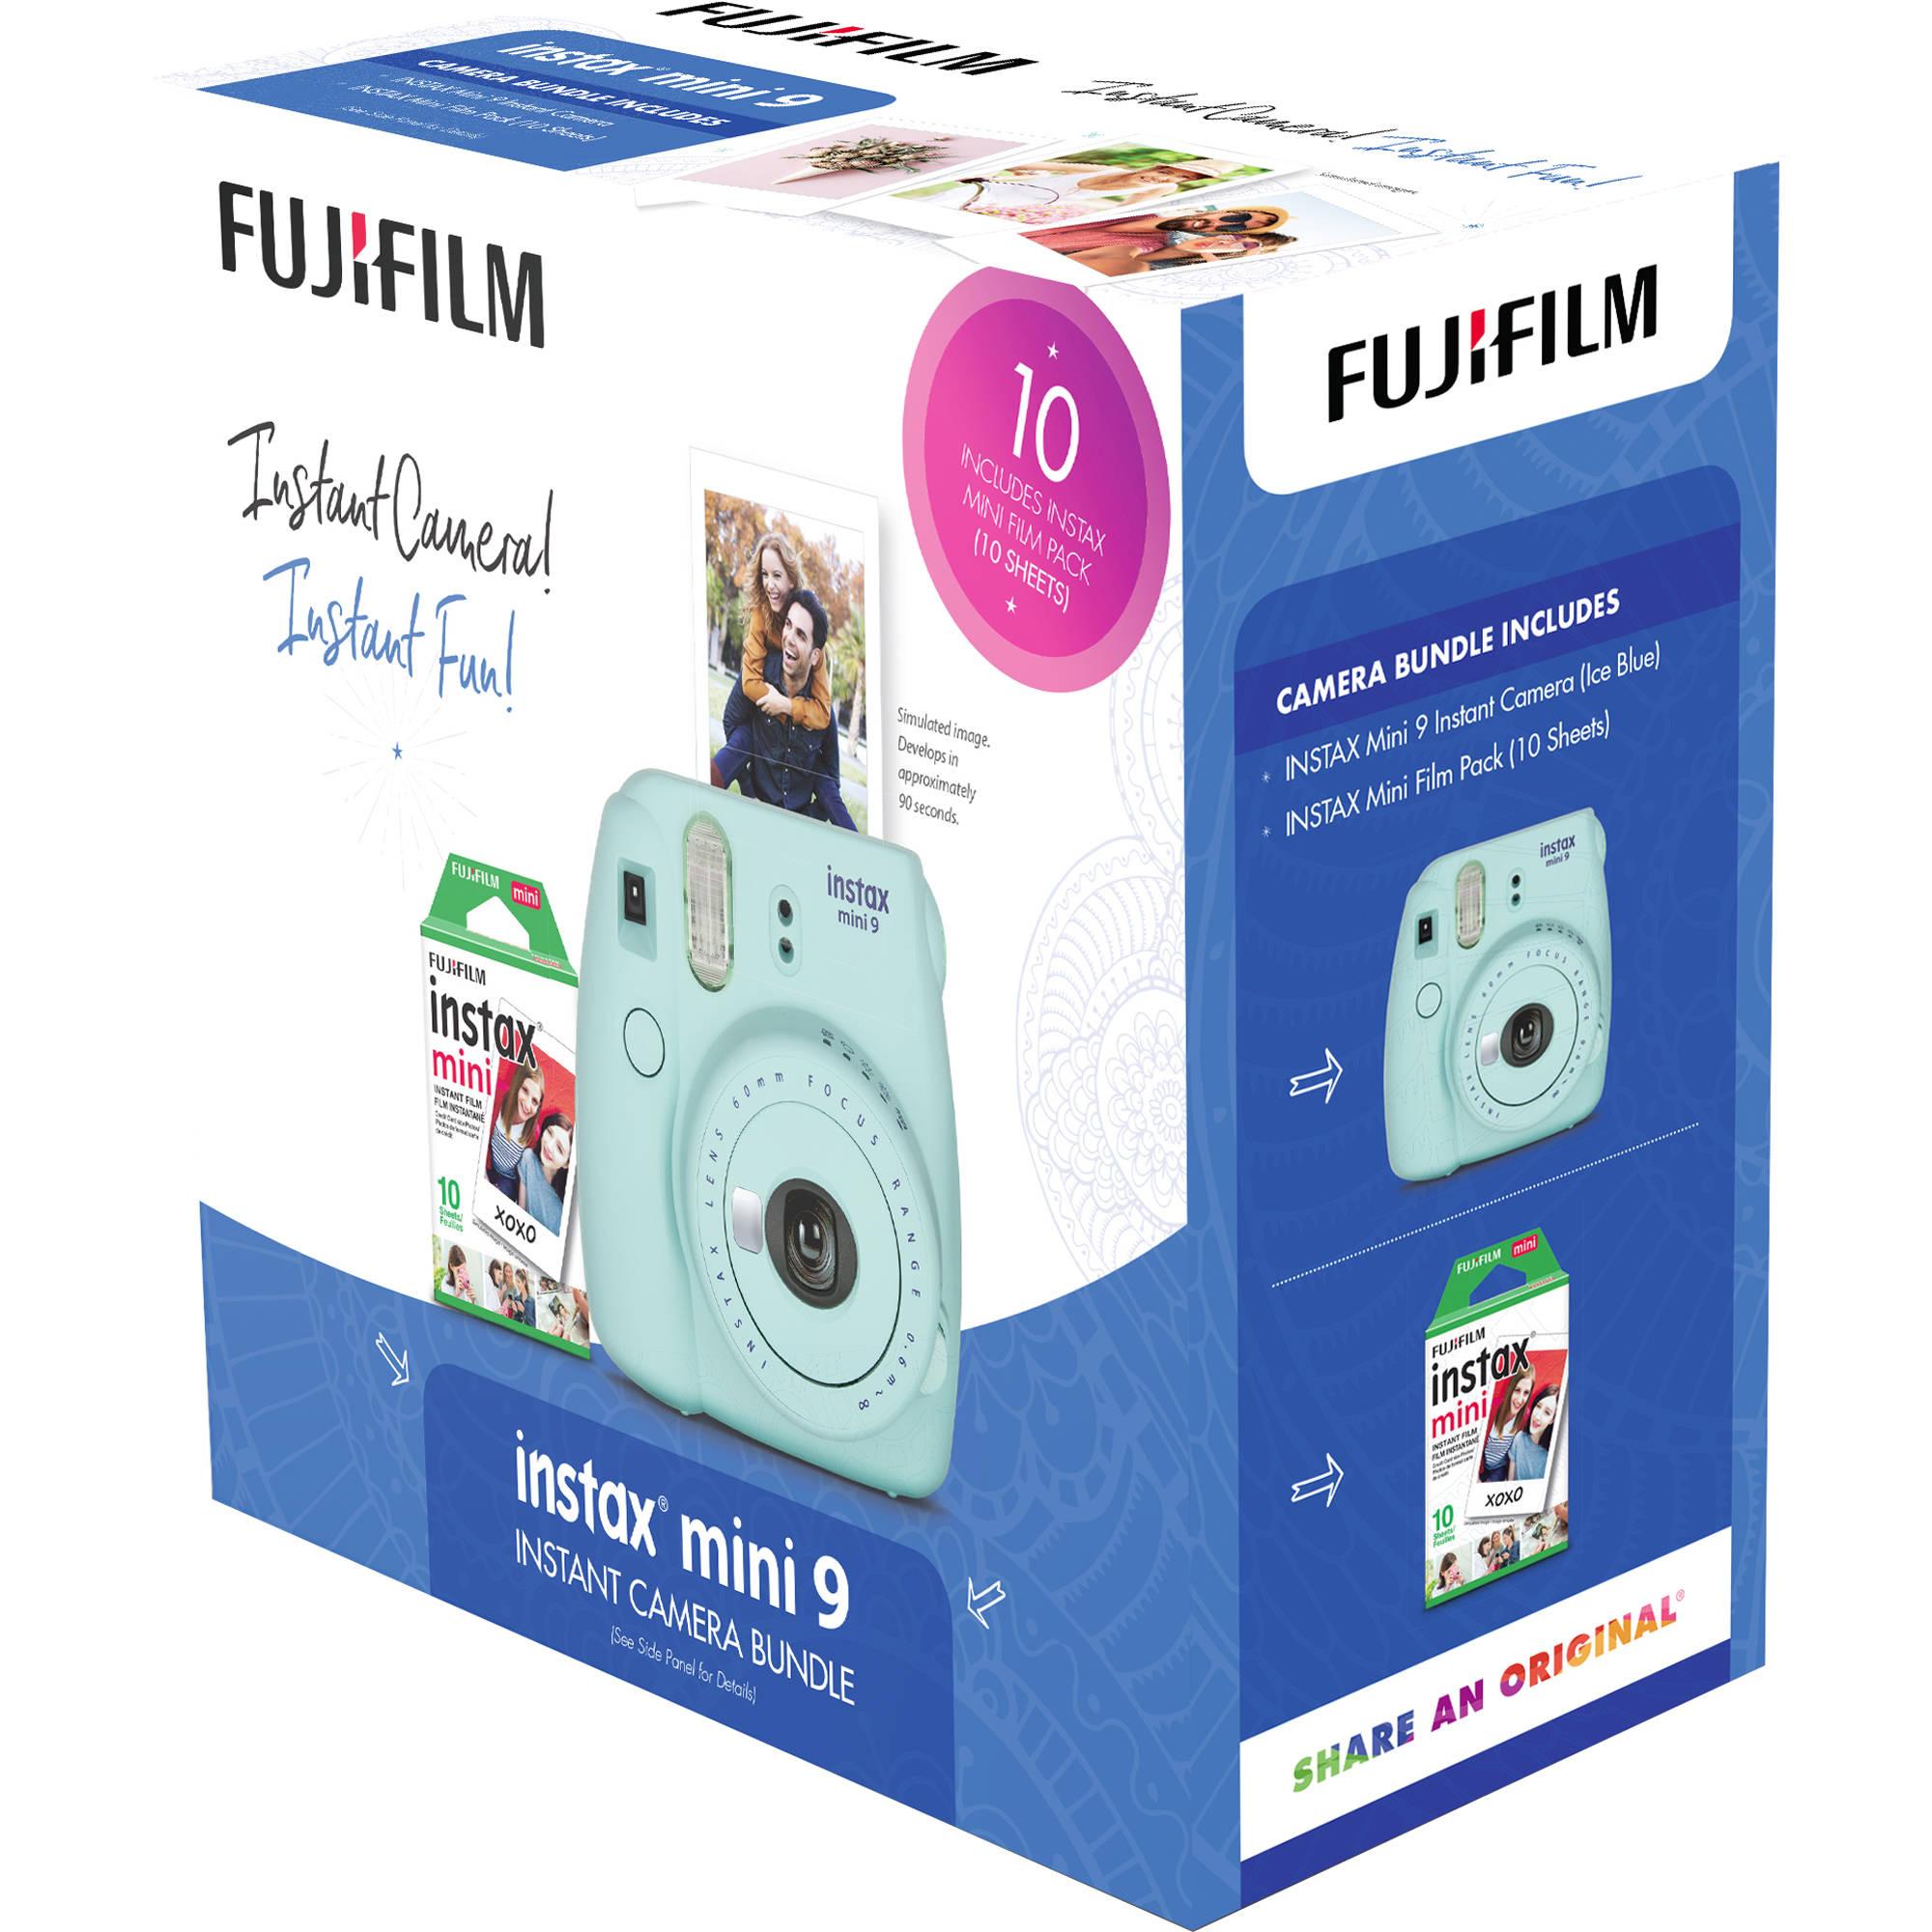 fujifilm_600020093_instax_mini_9_ice_1409270.jpg